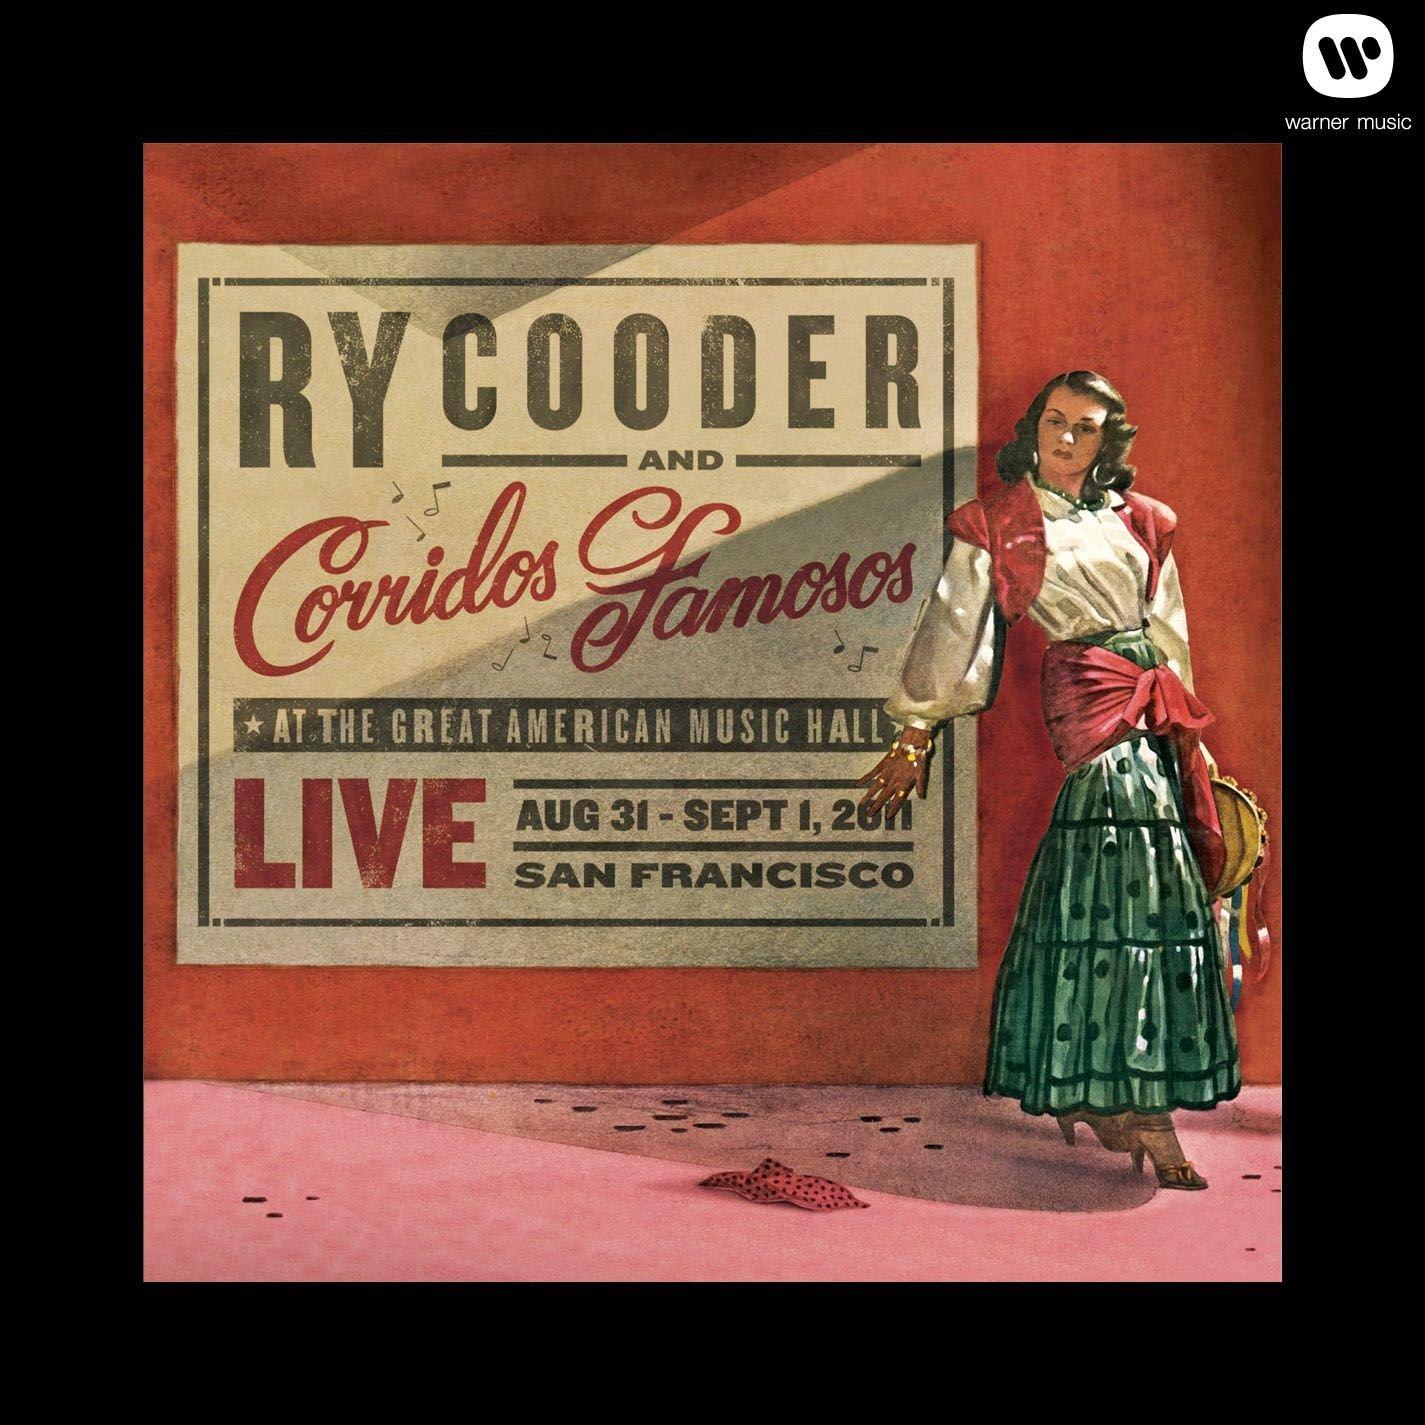 Ry Cooder Ry Cooder